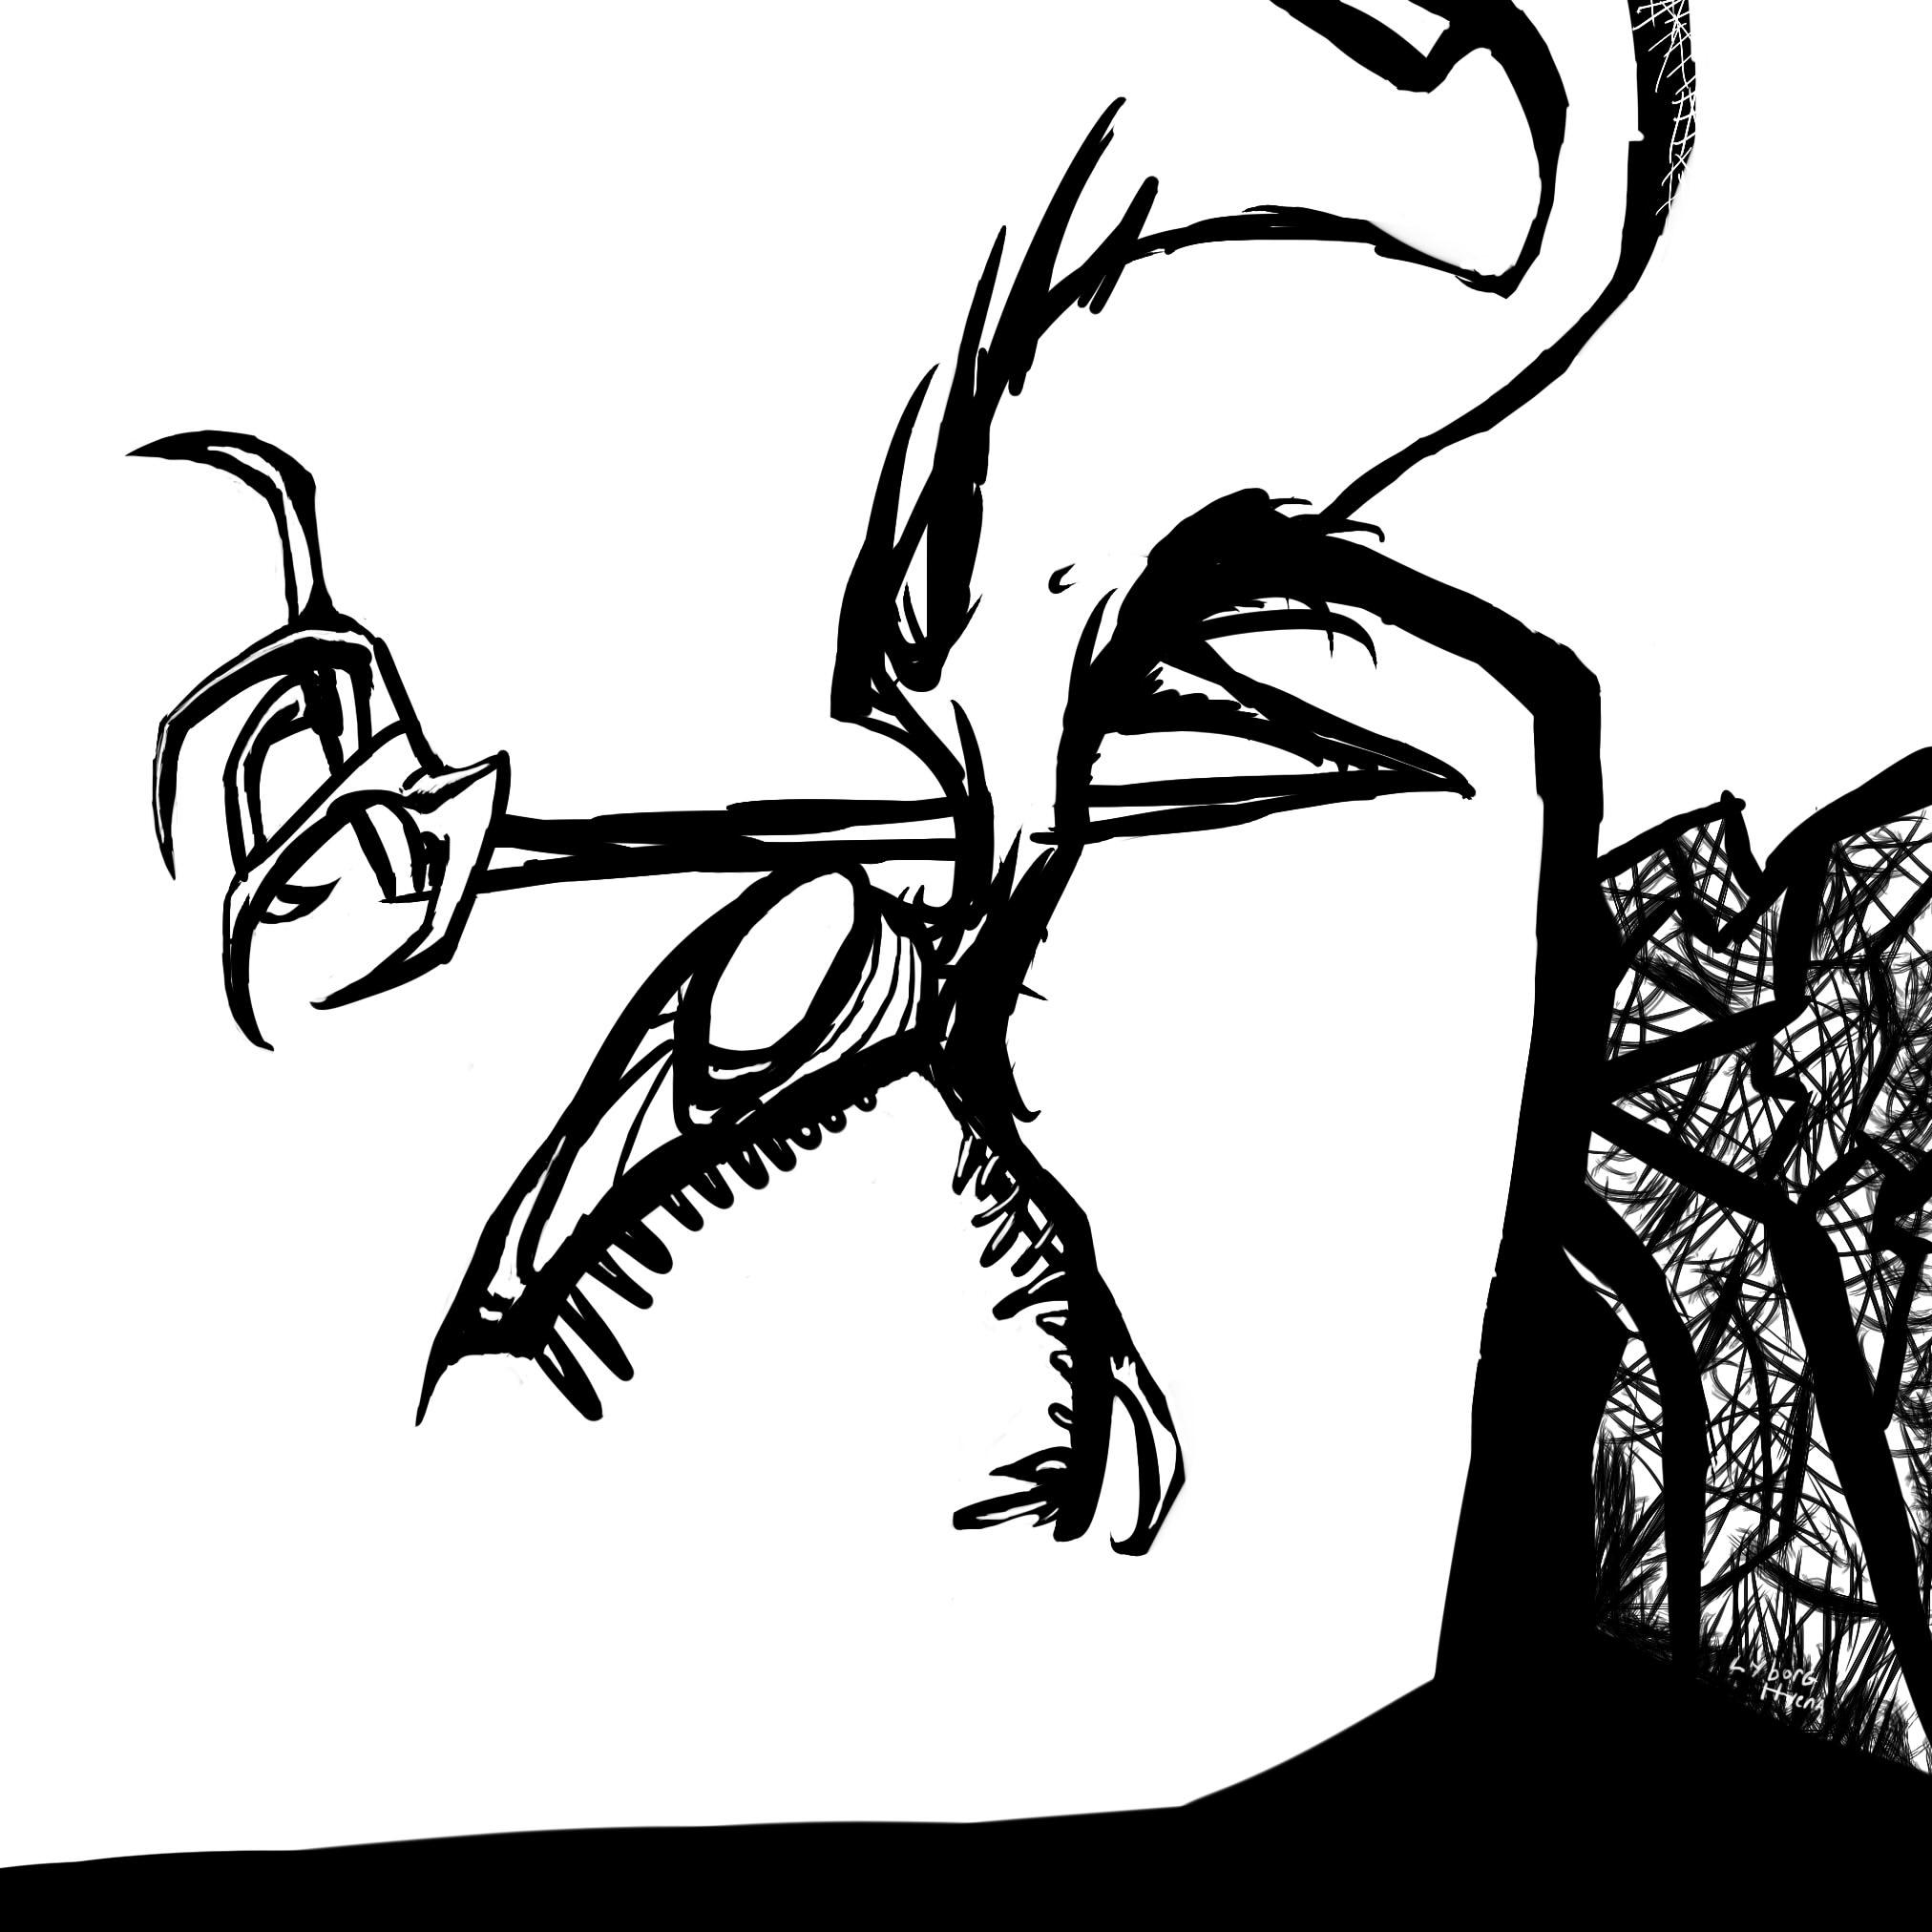 An Art of Infectious Diversion by cyborghyena